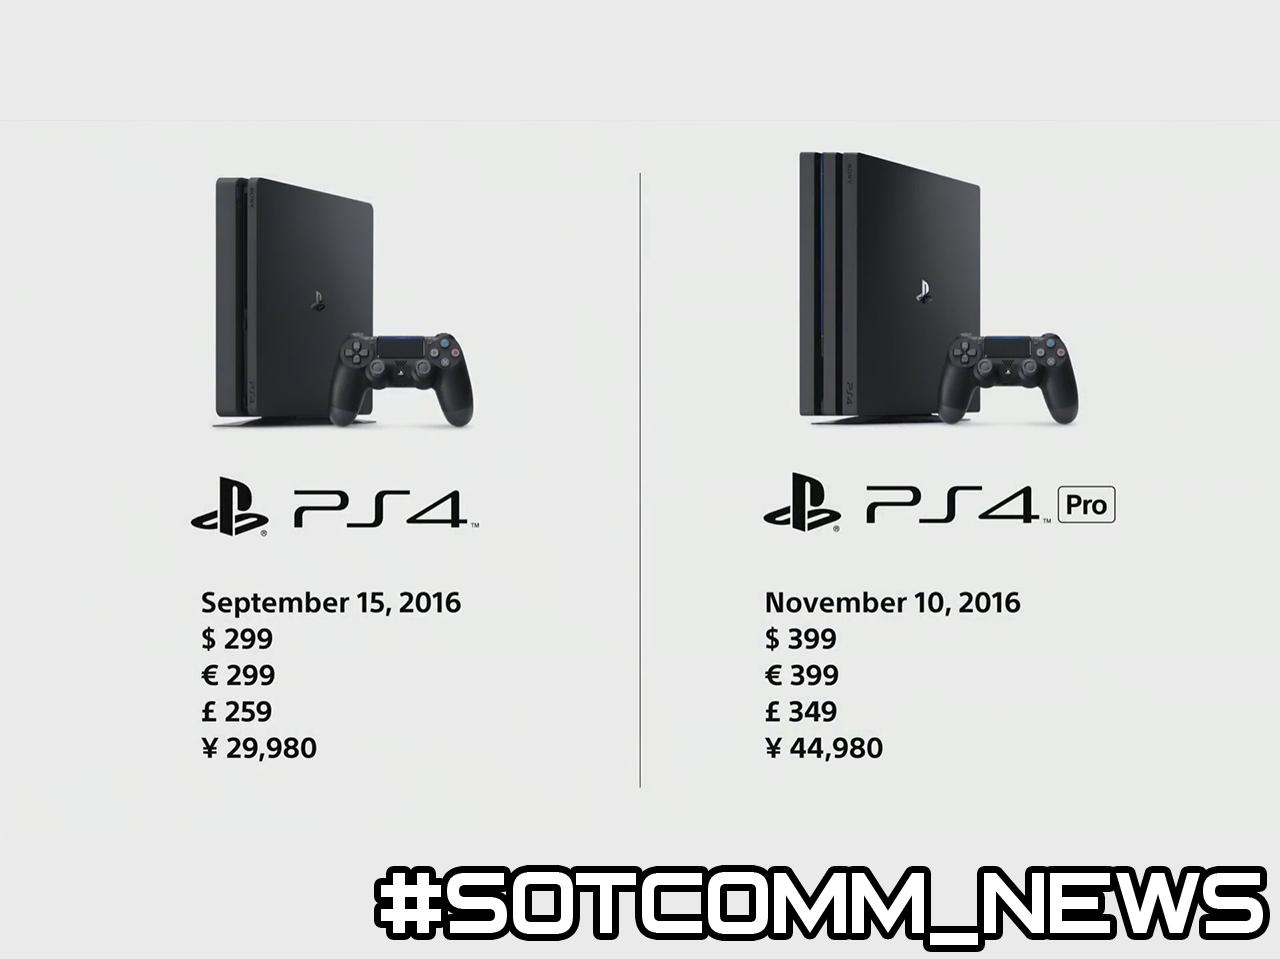 PlayStation 4 Slim PlayStation 4 PRO